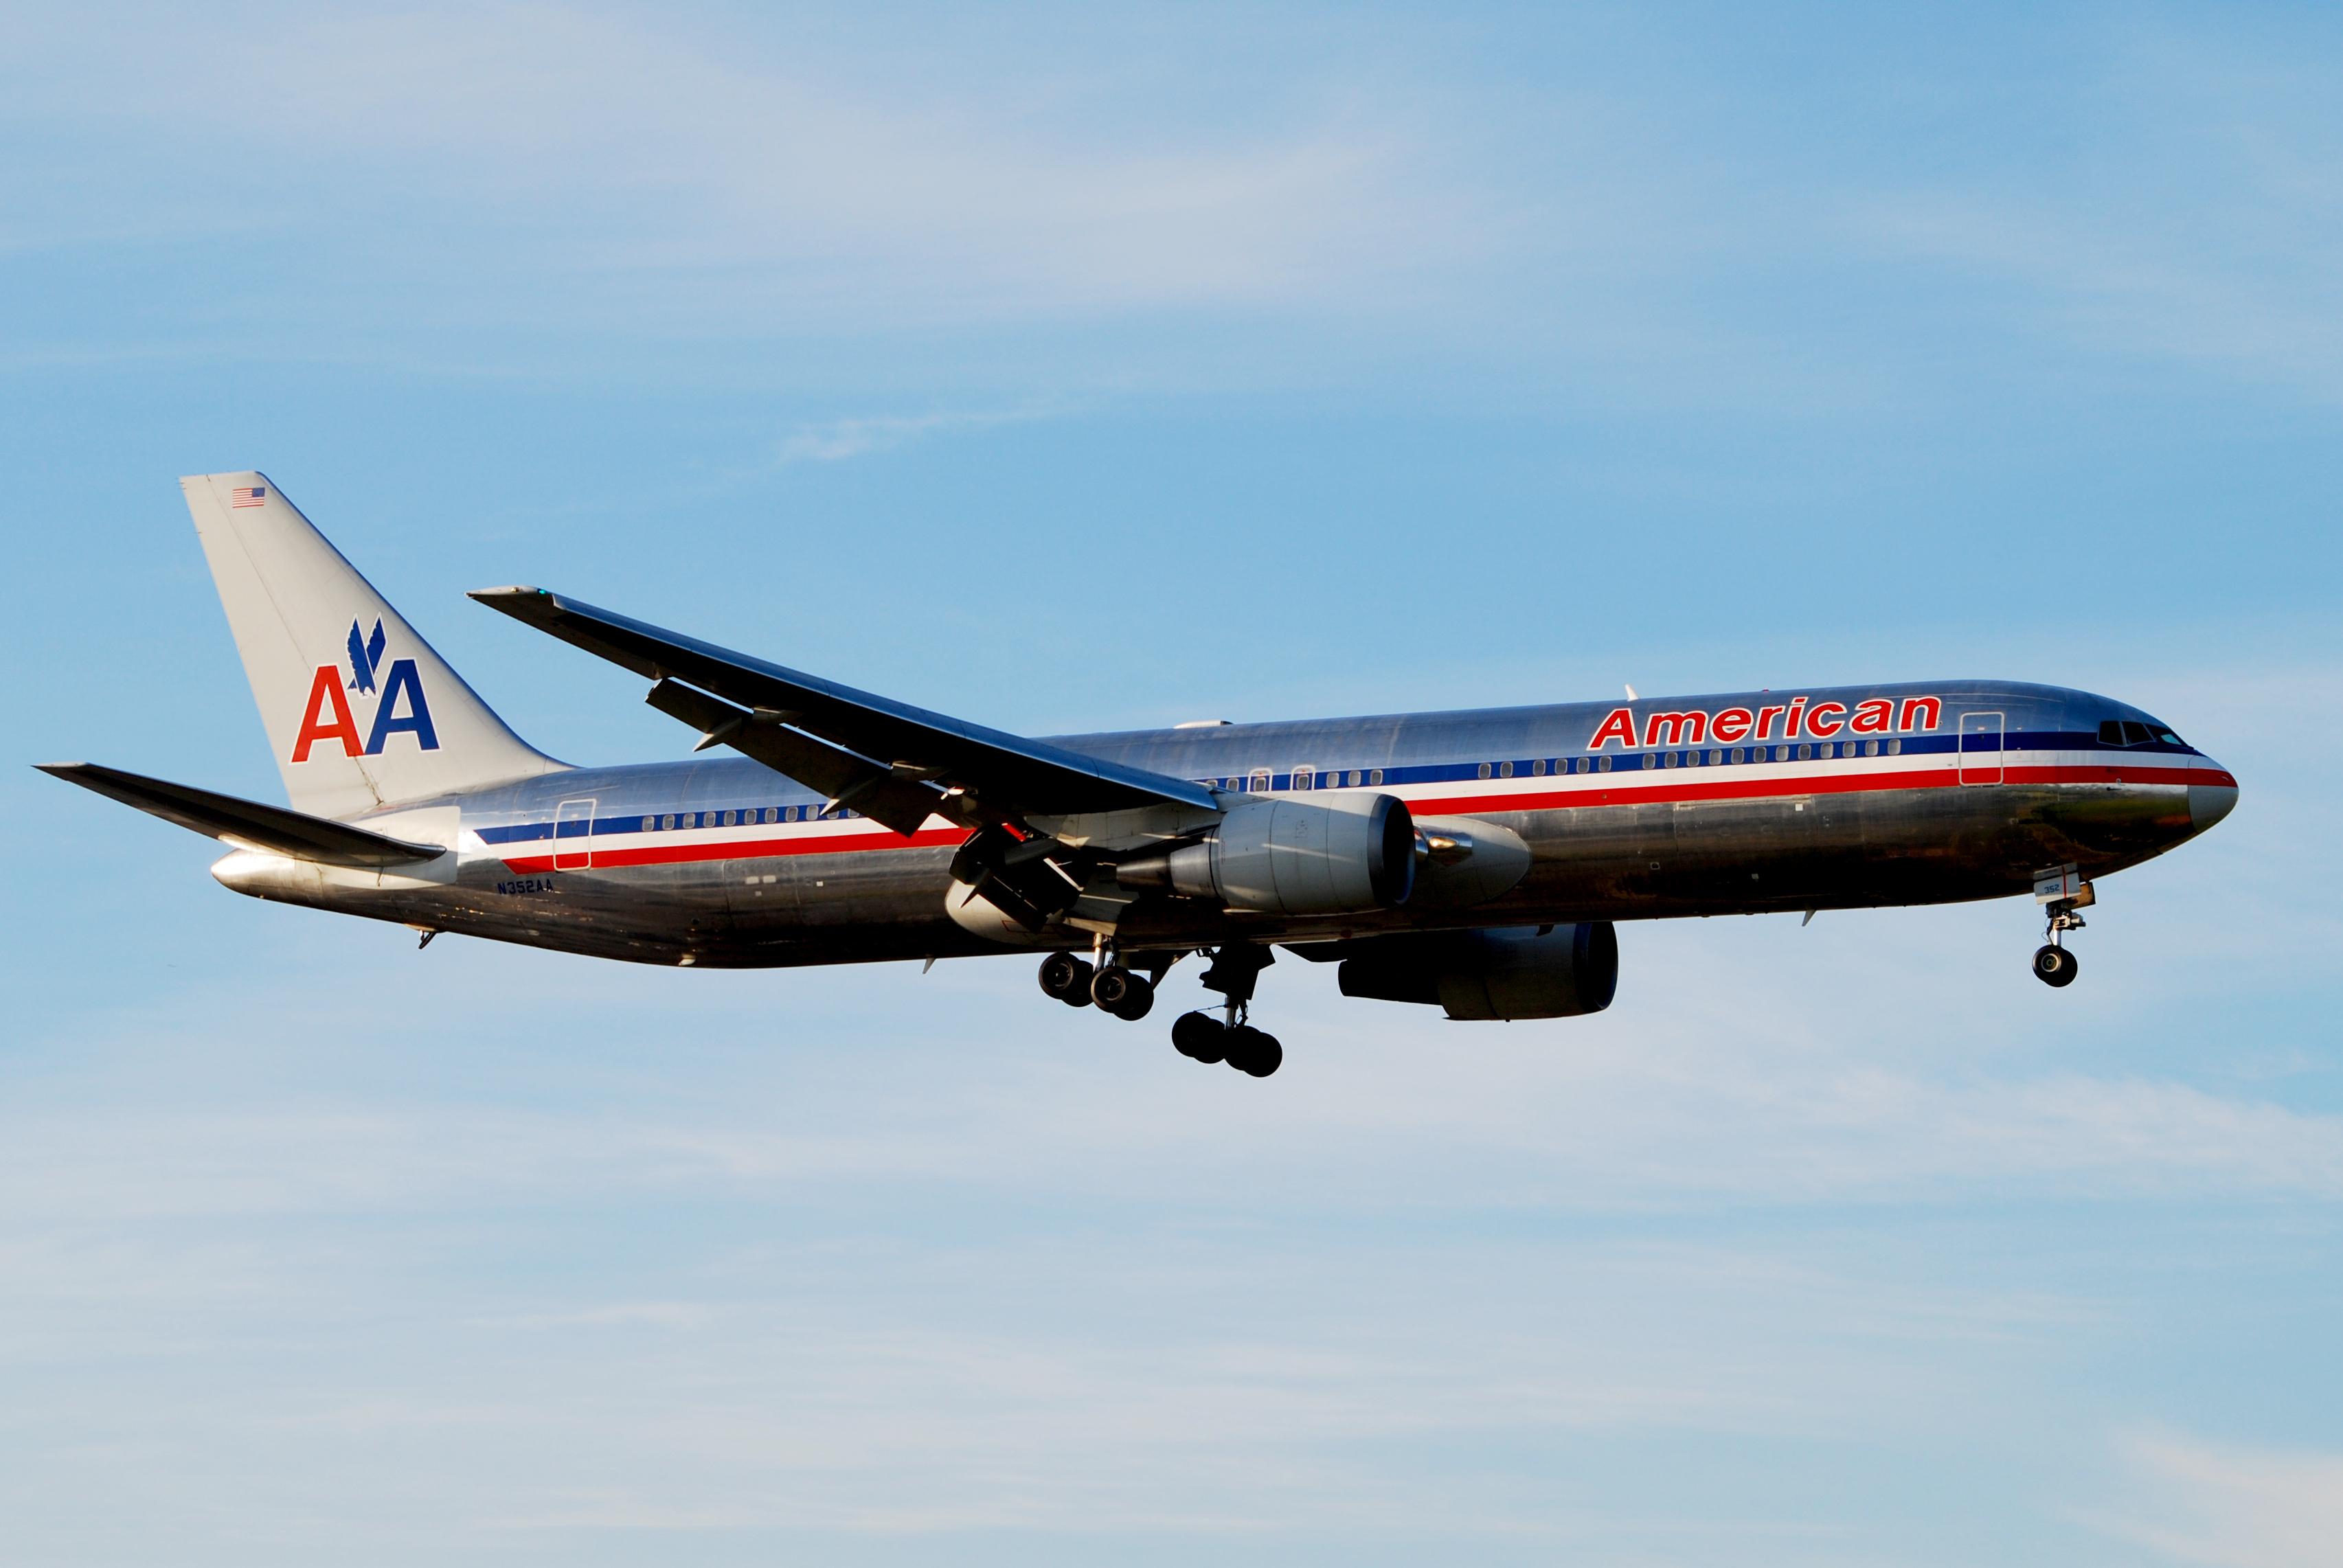 File:American Airlines.Boeing 767-300ER.LHR.2009.jpg ...